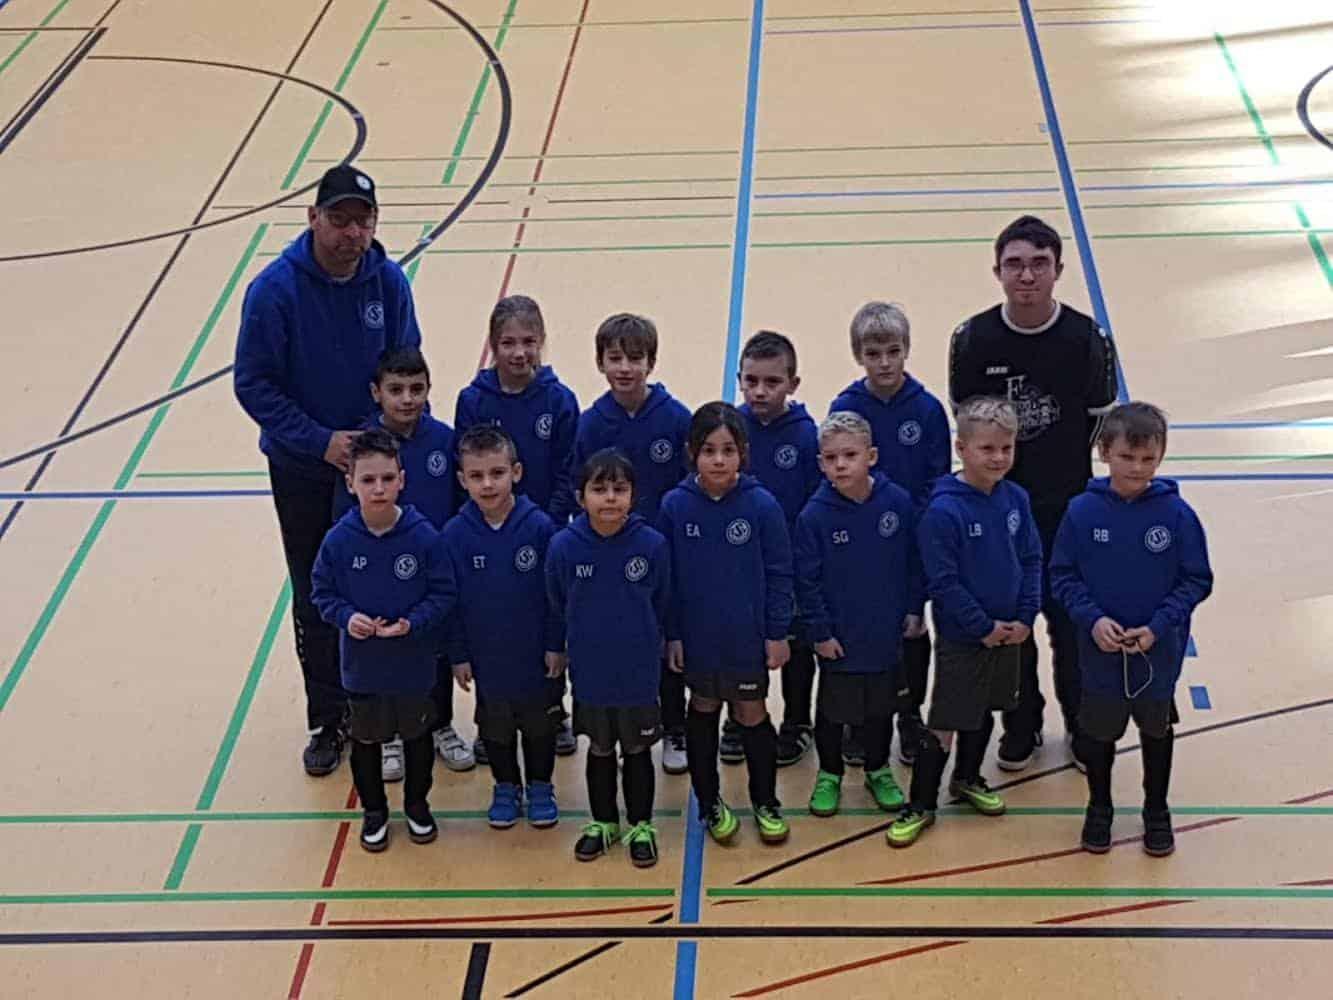 F-Jugend Turnier ESV Augsburg 2020